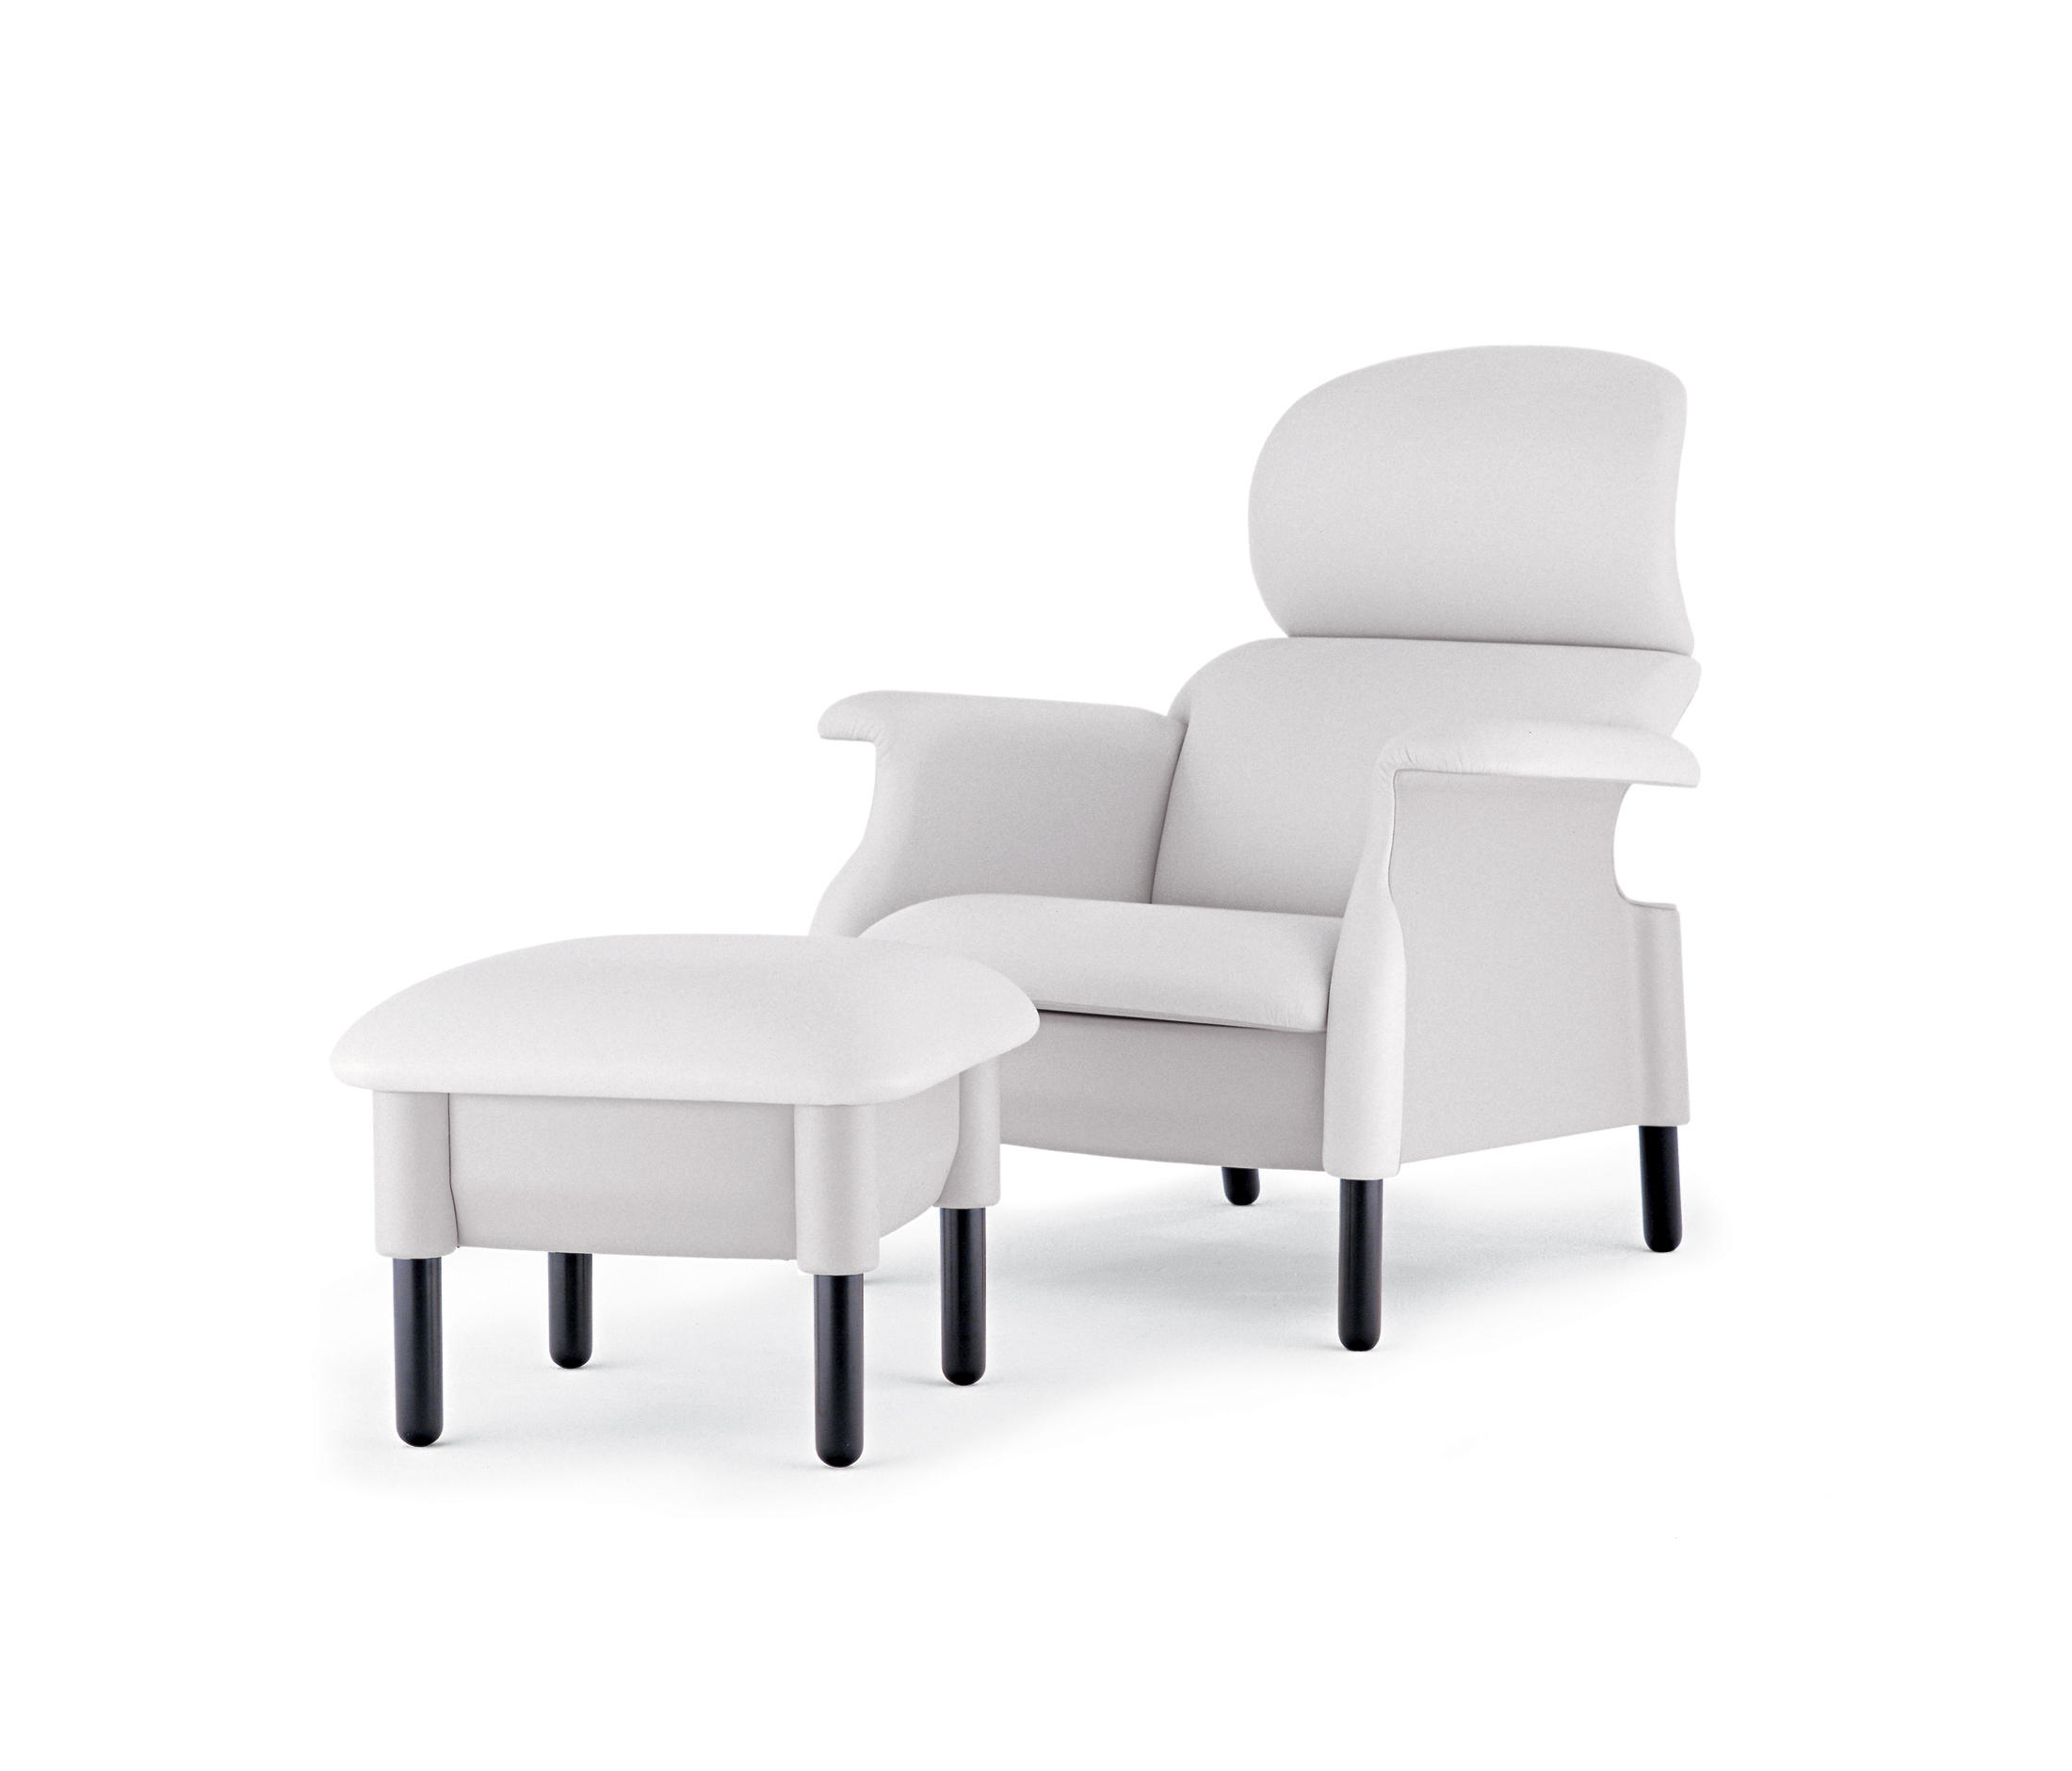 sanluca sessel von poltrona frau architonic. Black Bedroom Furniture Sets. Home Design Ideas